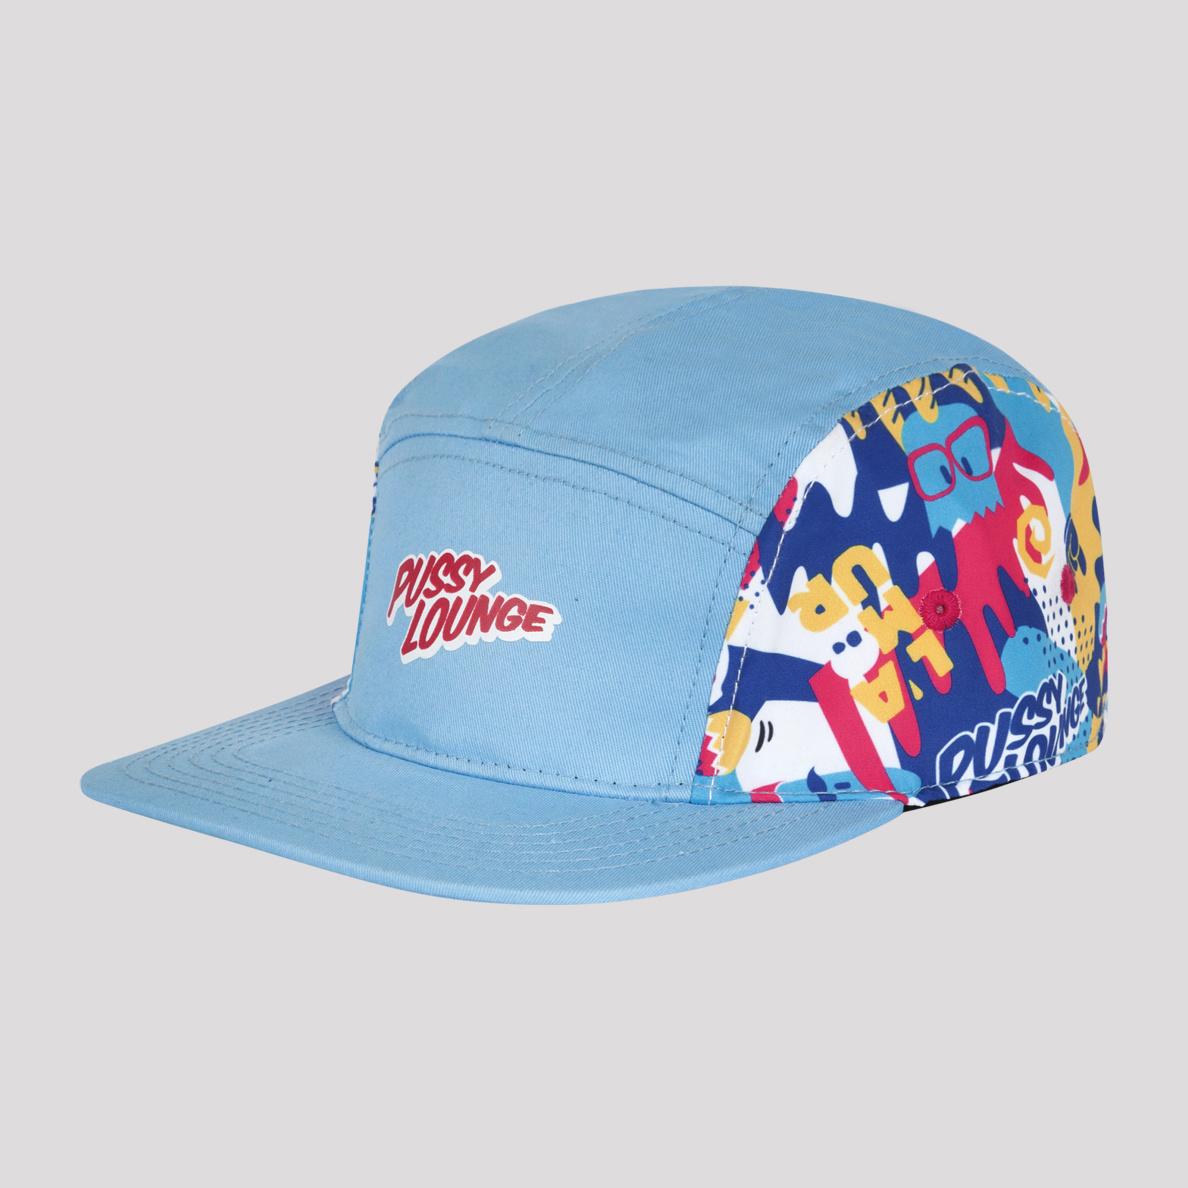 PUSSY LOUNGE PANEL CAP BLUE/MULTICOLOR